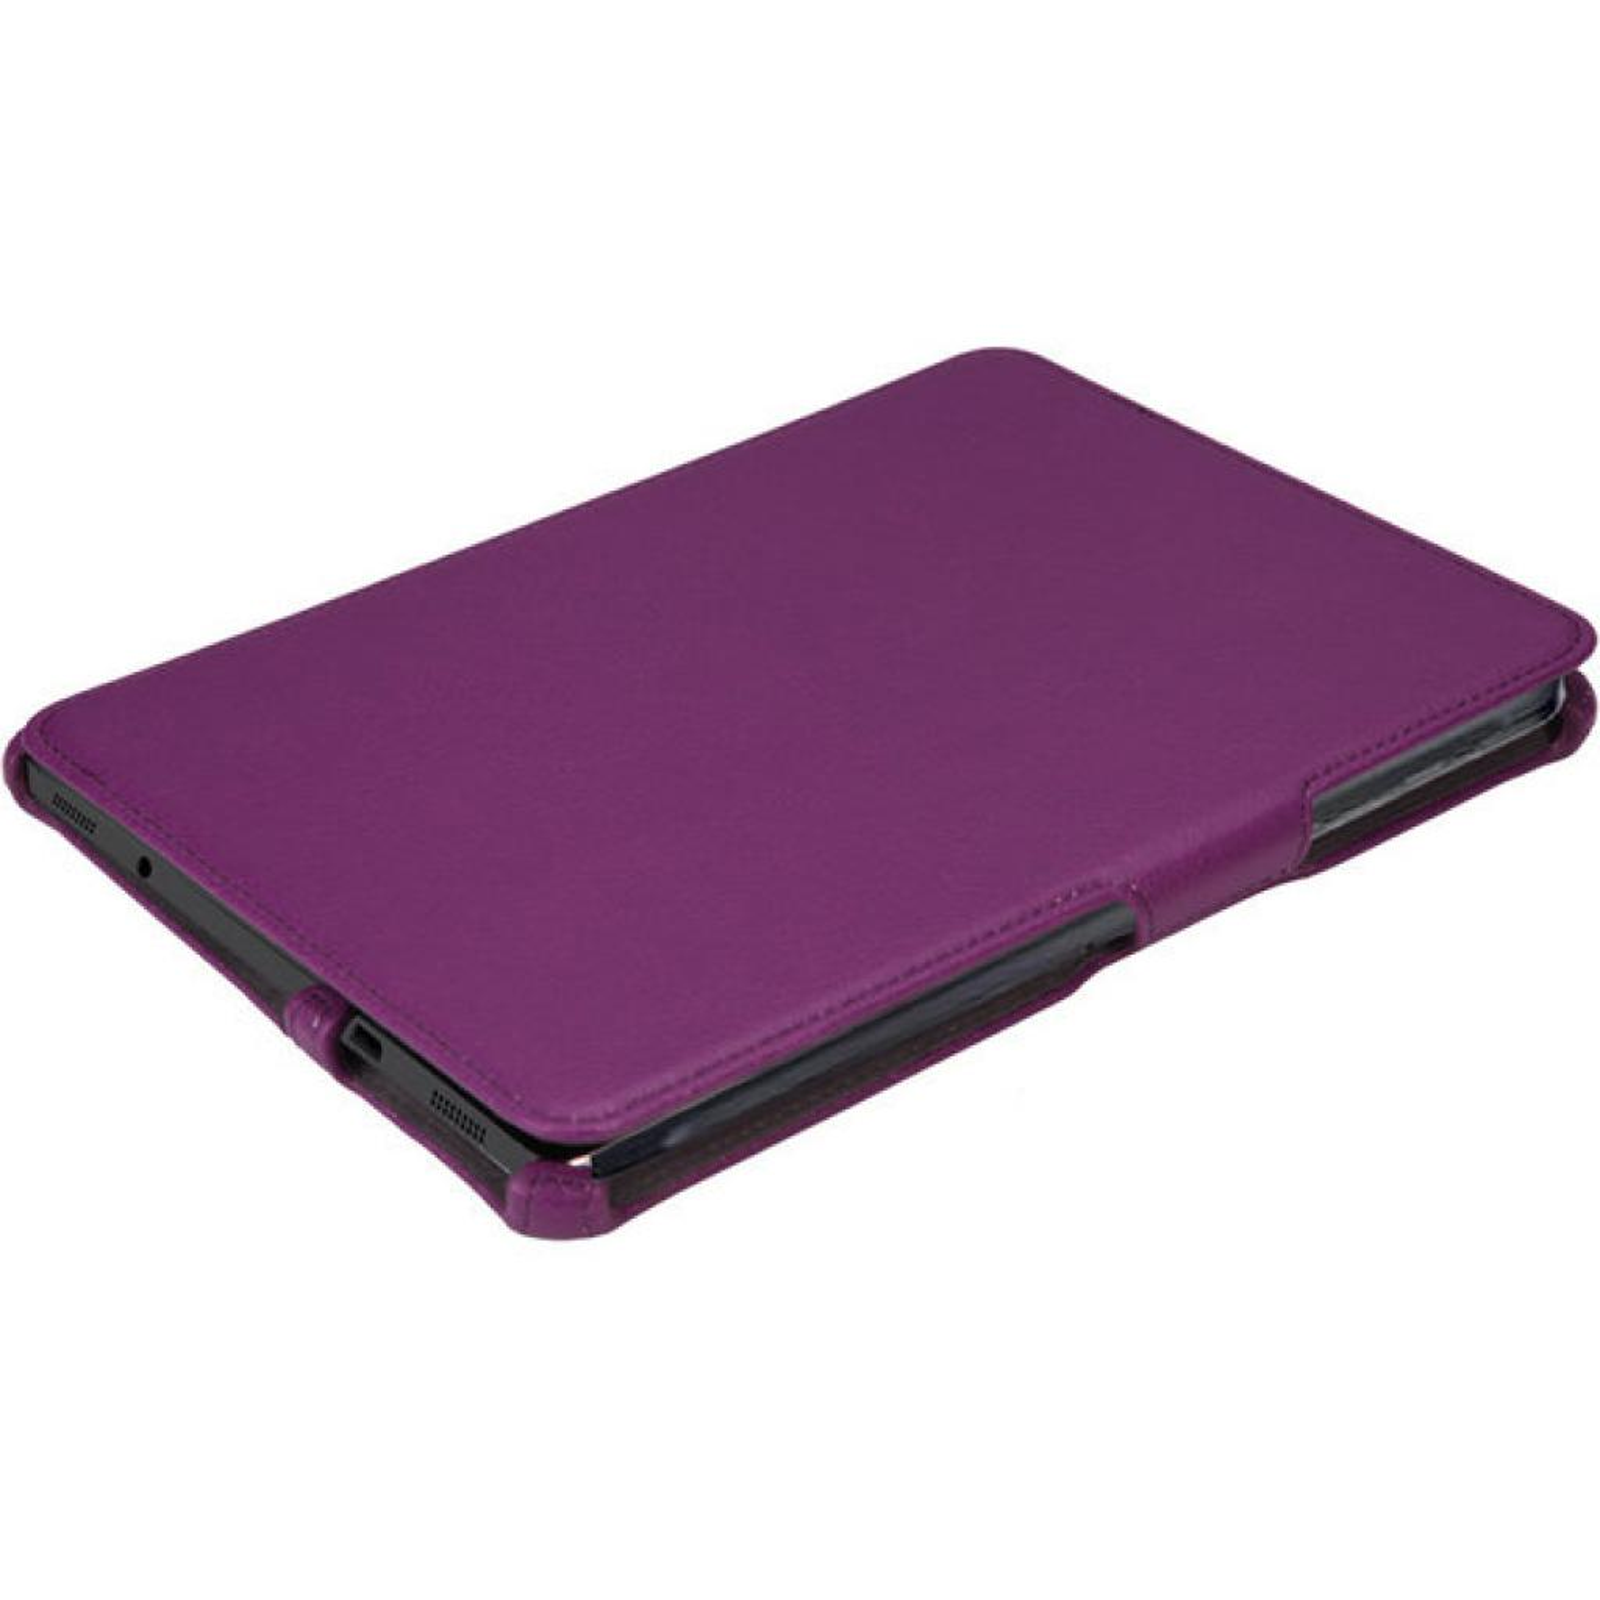 Чехол для планшета AirOn для Samsung Galaxy Tab S 2 9.7 viol (4822352777852) изображение 3